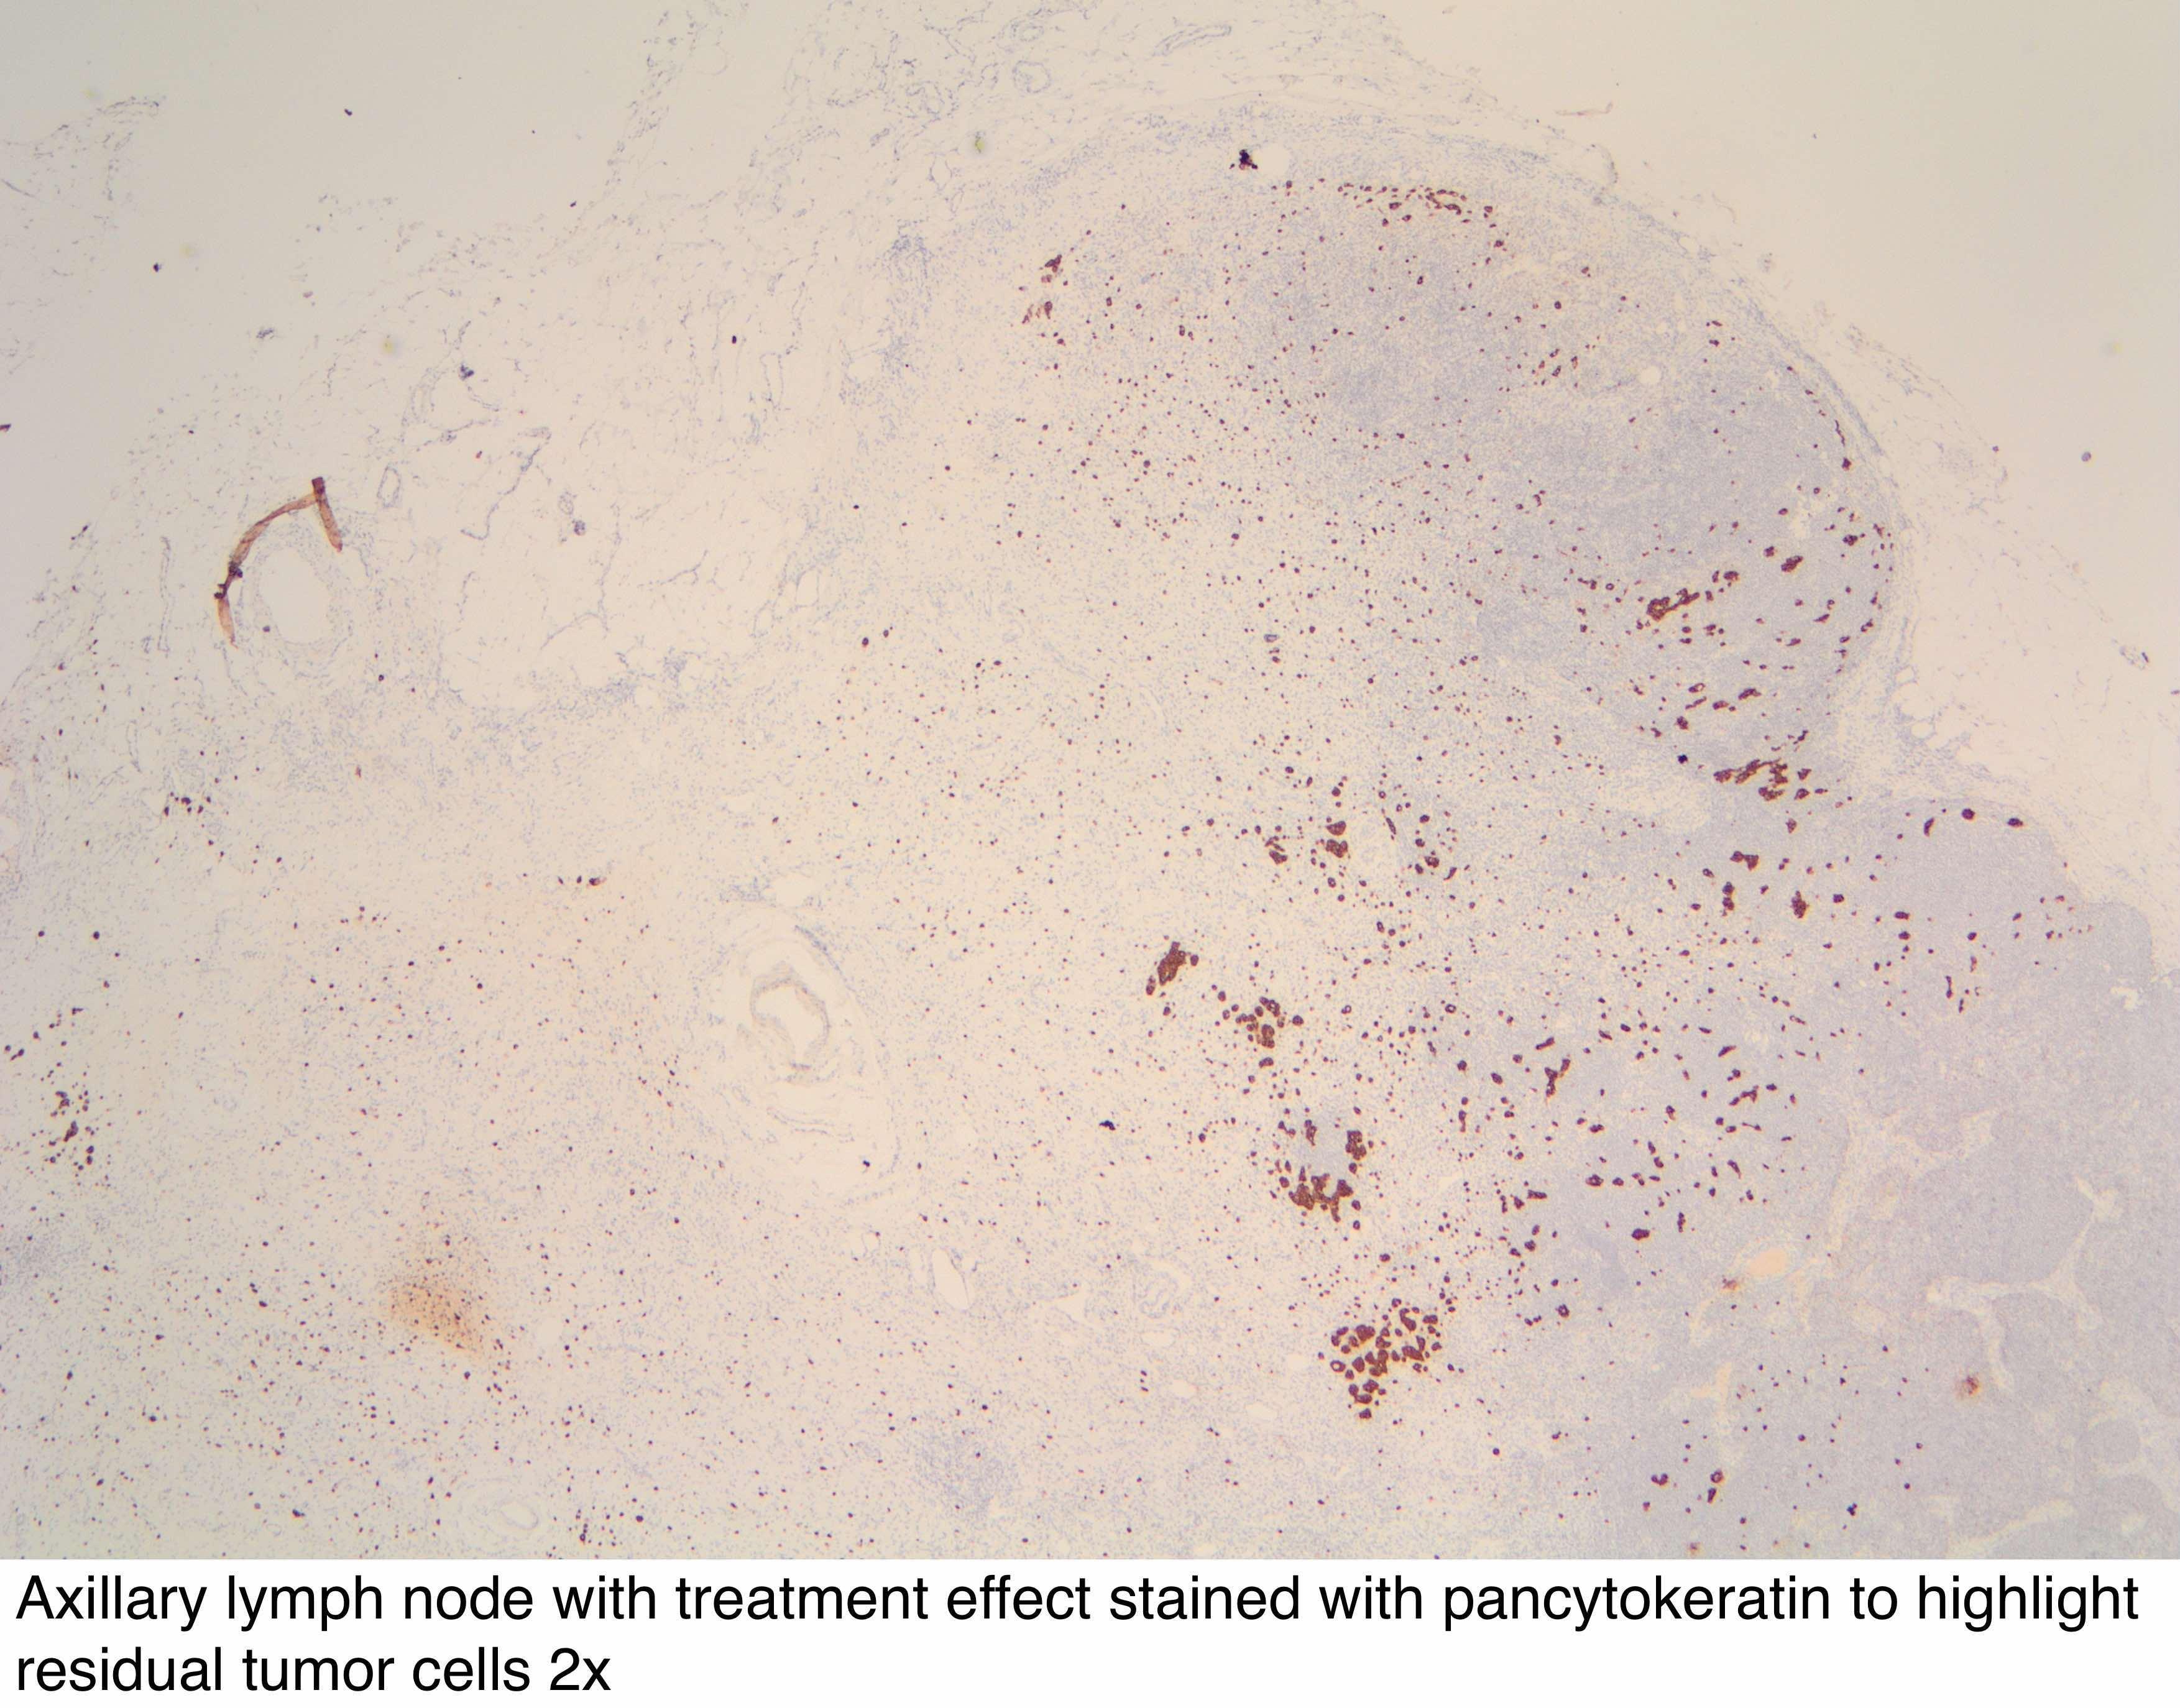 Pathology Outlines Axillary Lymph Node Examination